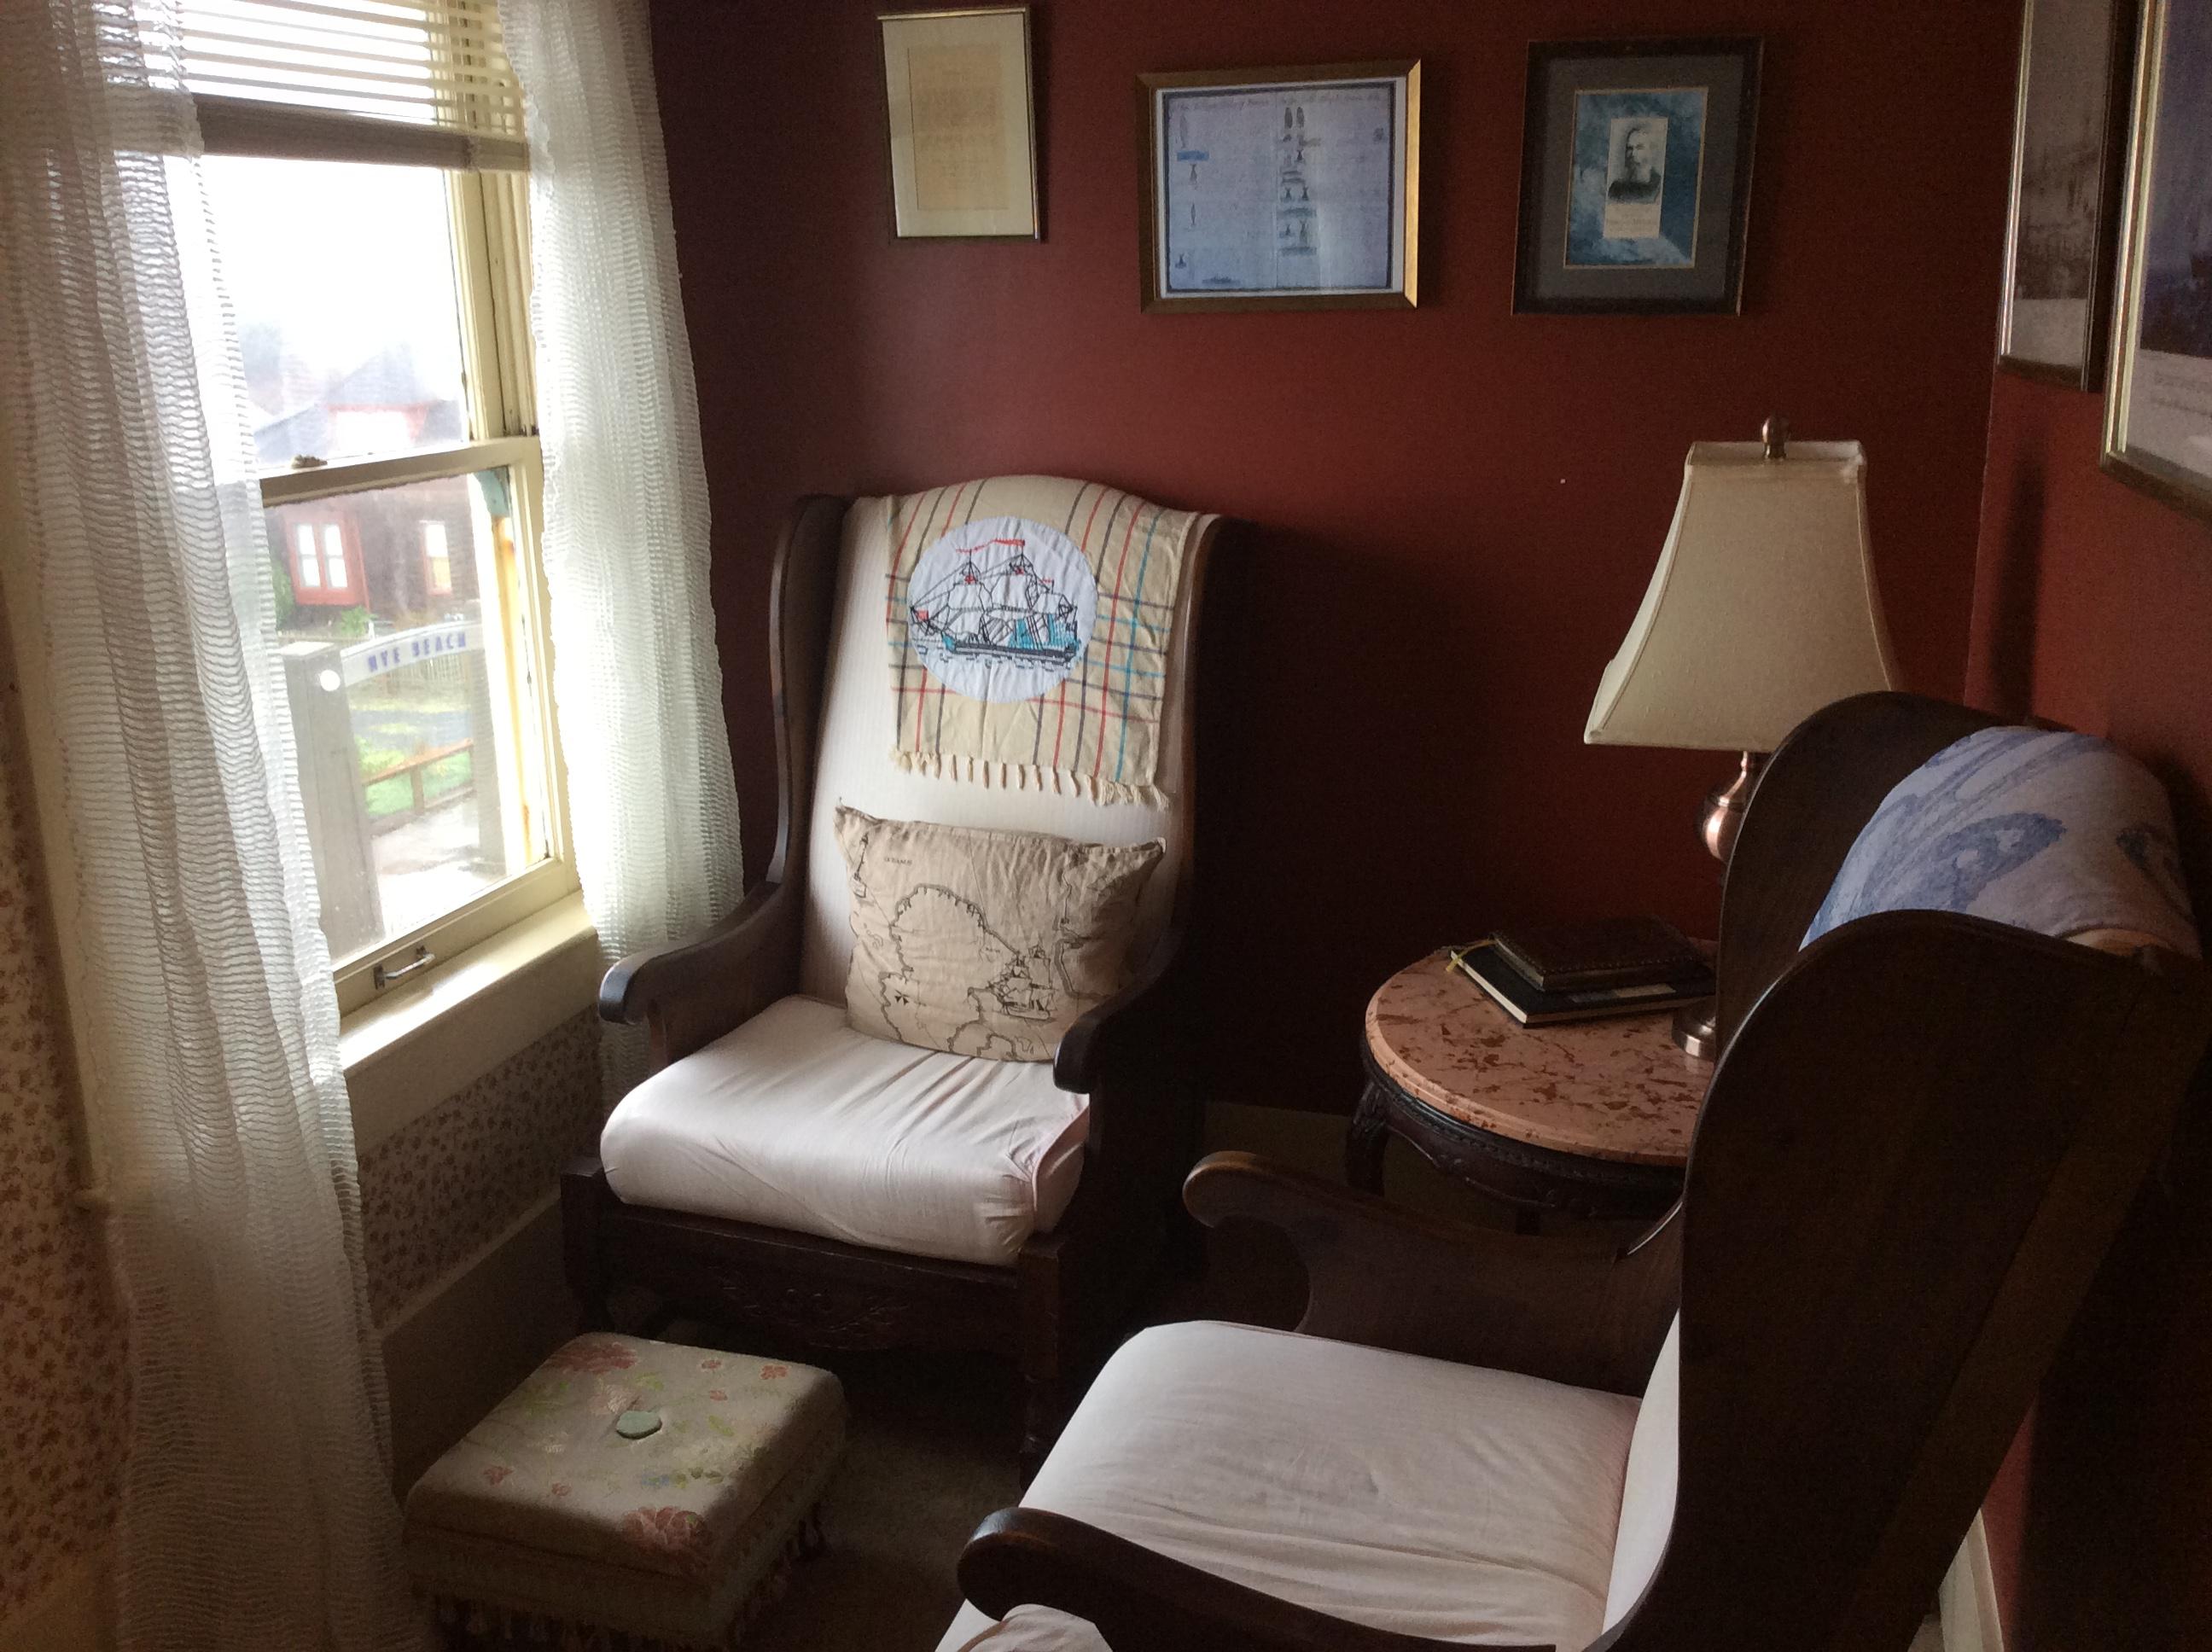 melville room sylvia beach literary hotel